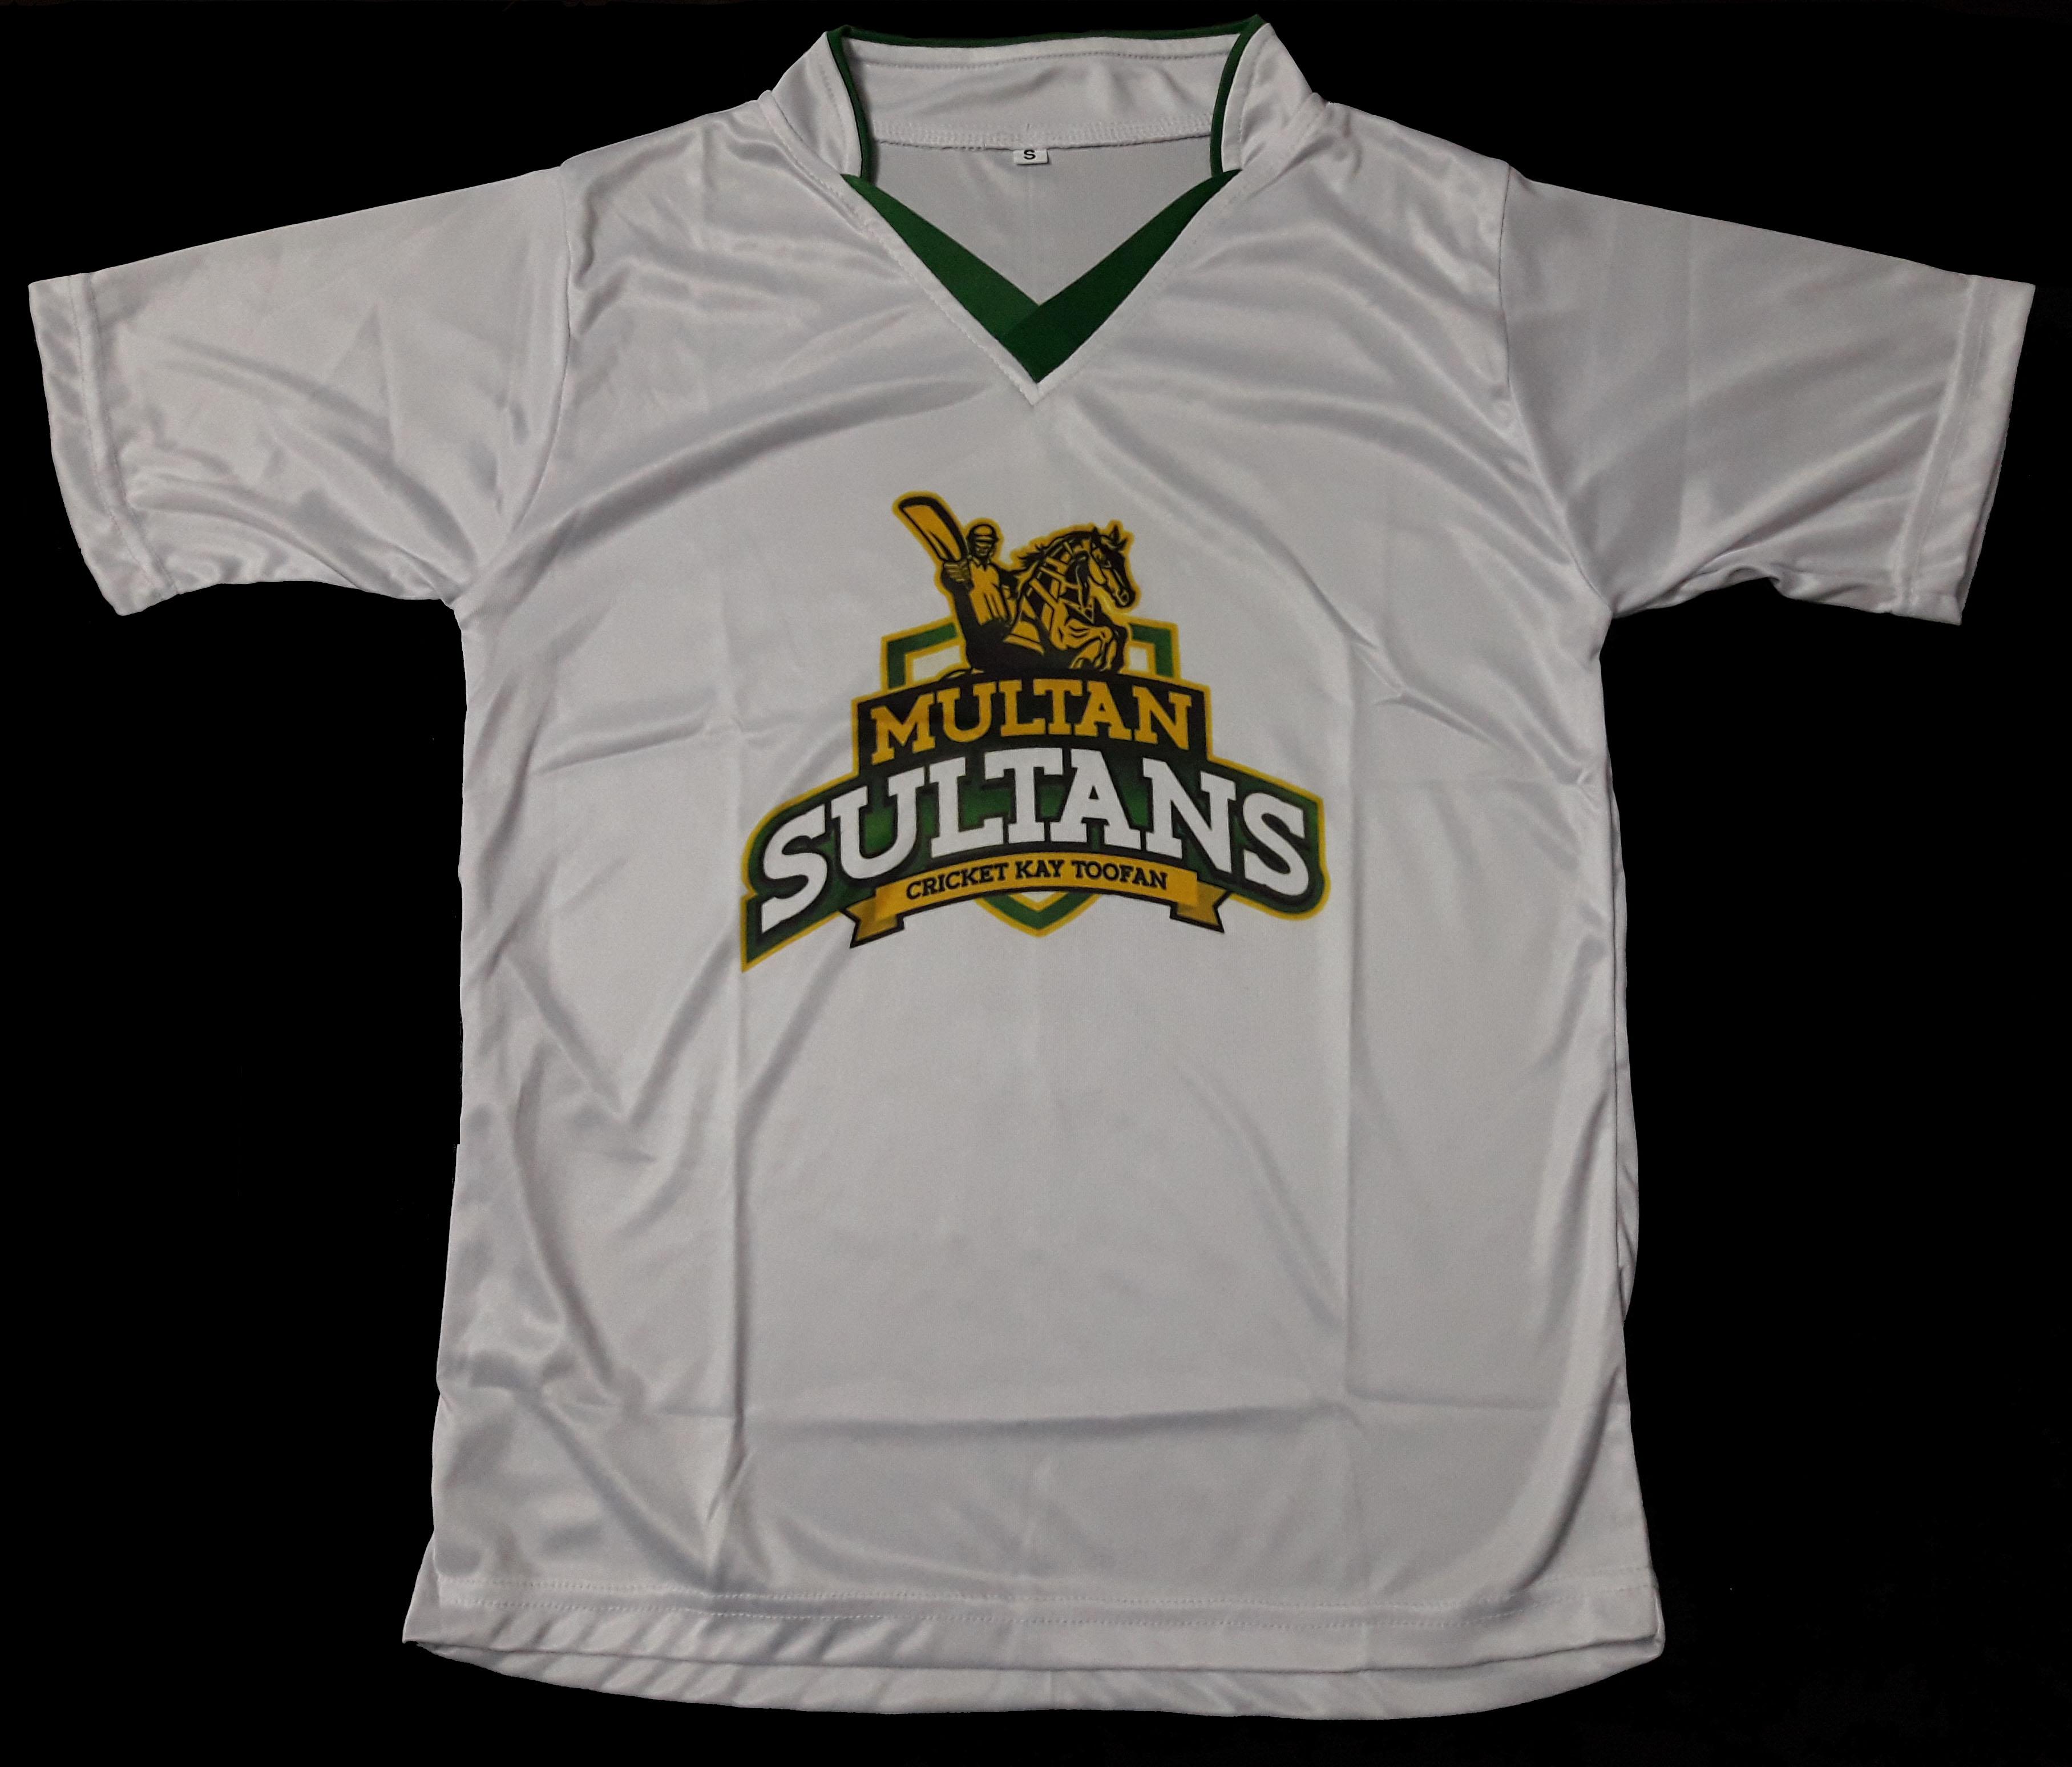 Multan Sultan PSL 2018 Shirt gentryhive